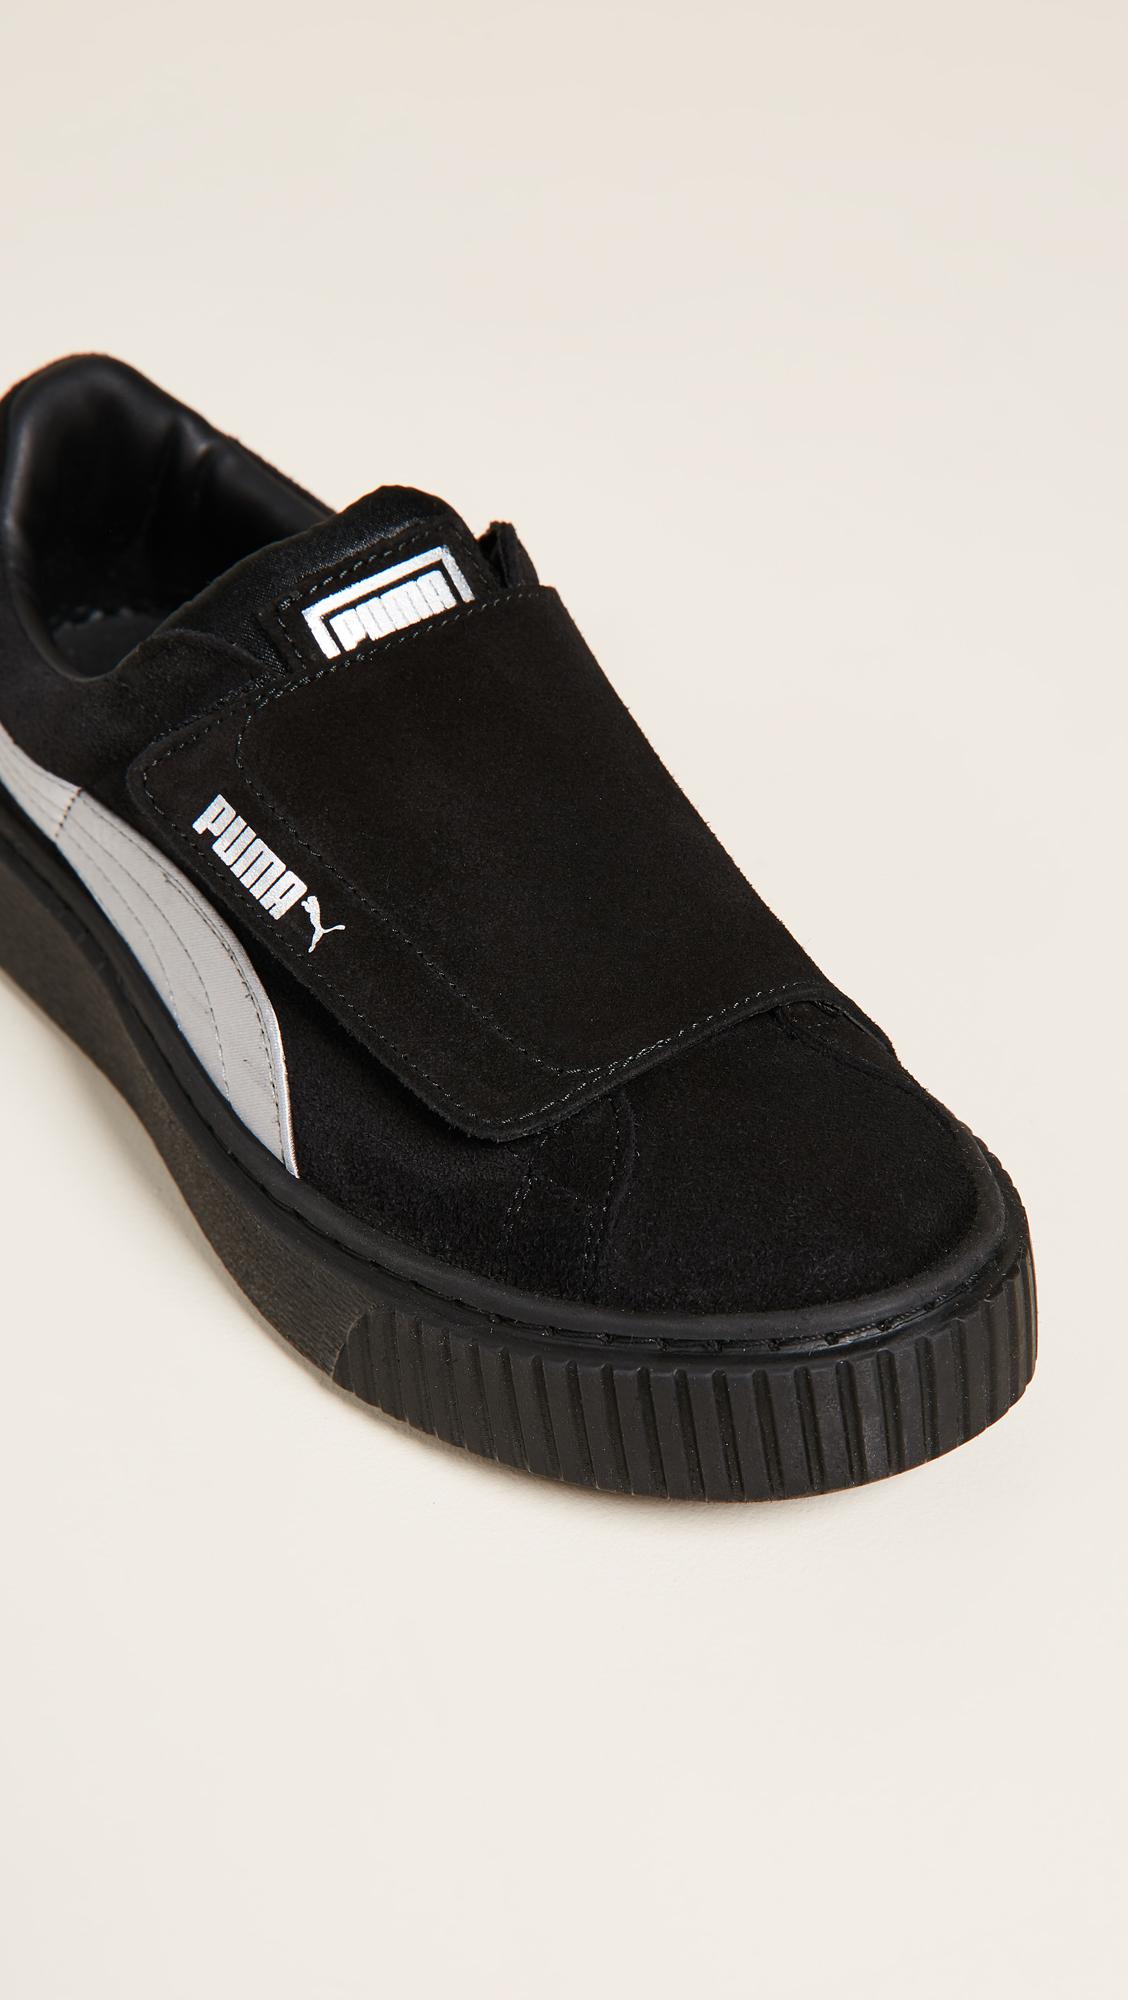 fbfdba8387a9 PUMA Platform Strap Satin EP Sneakers